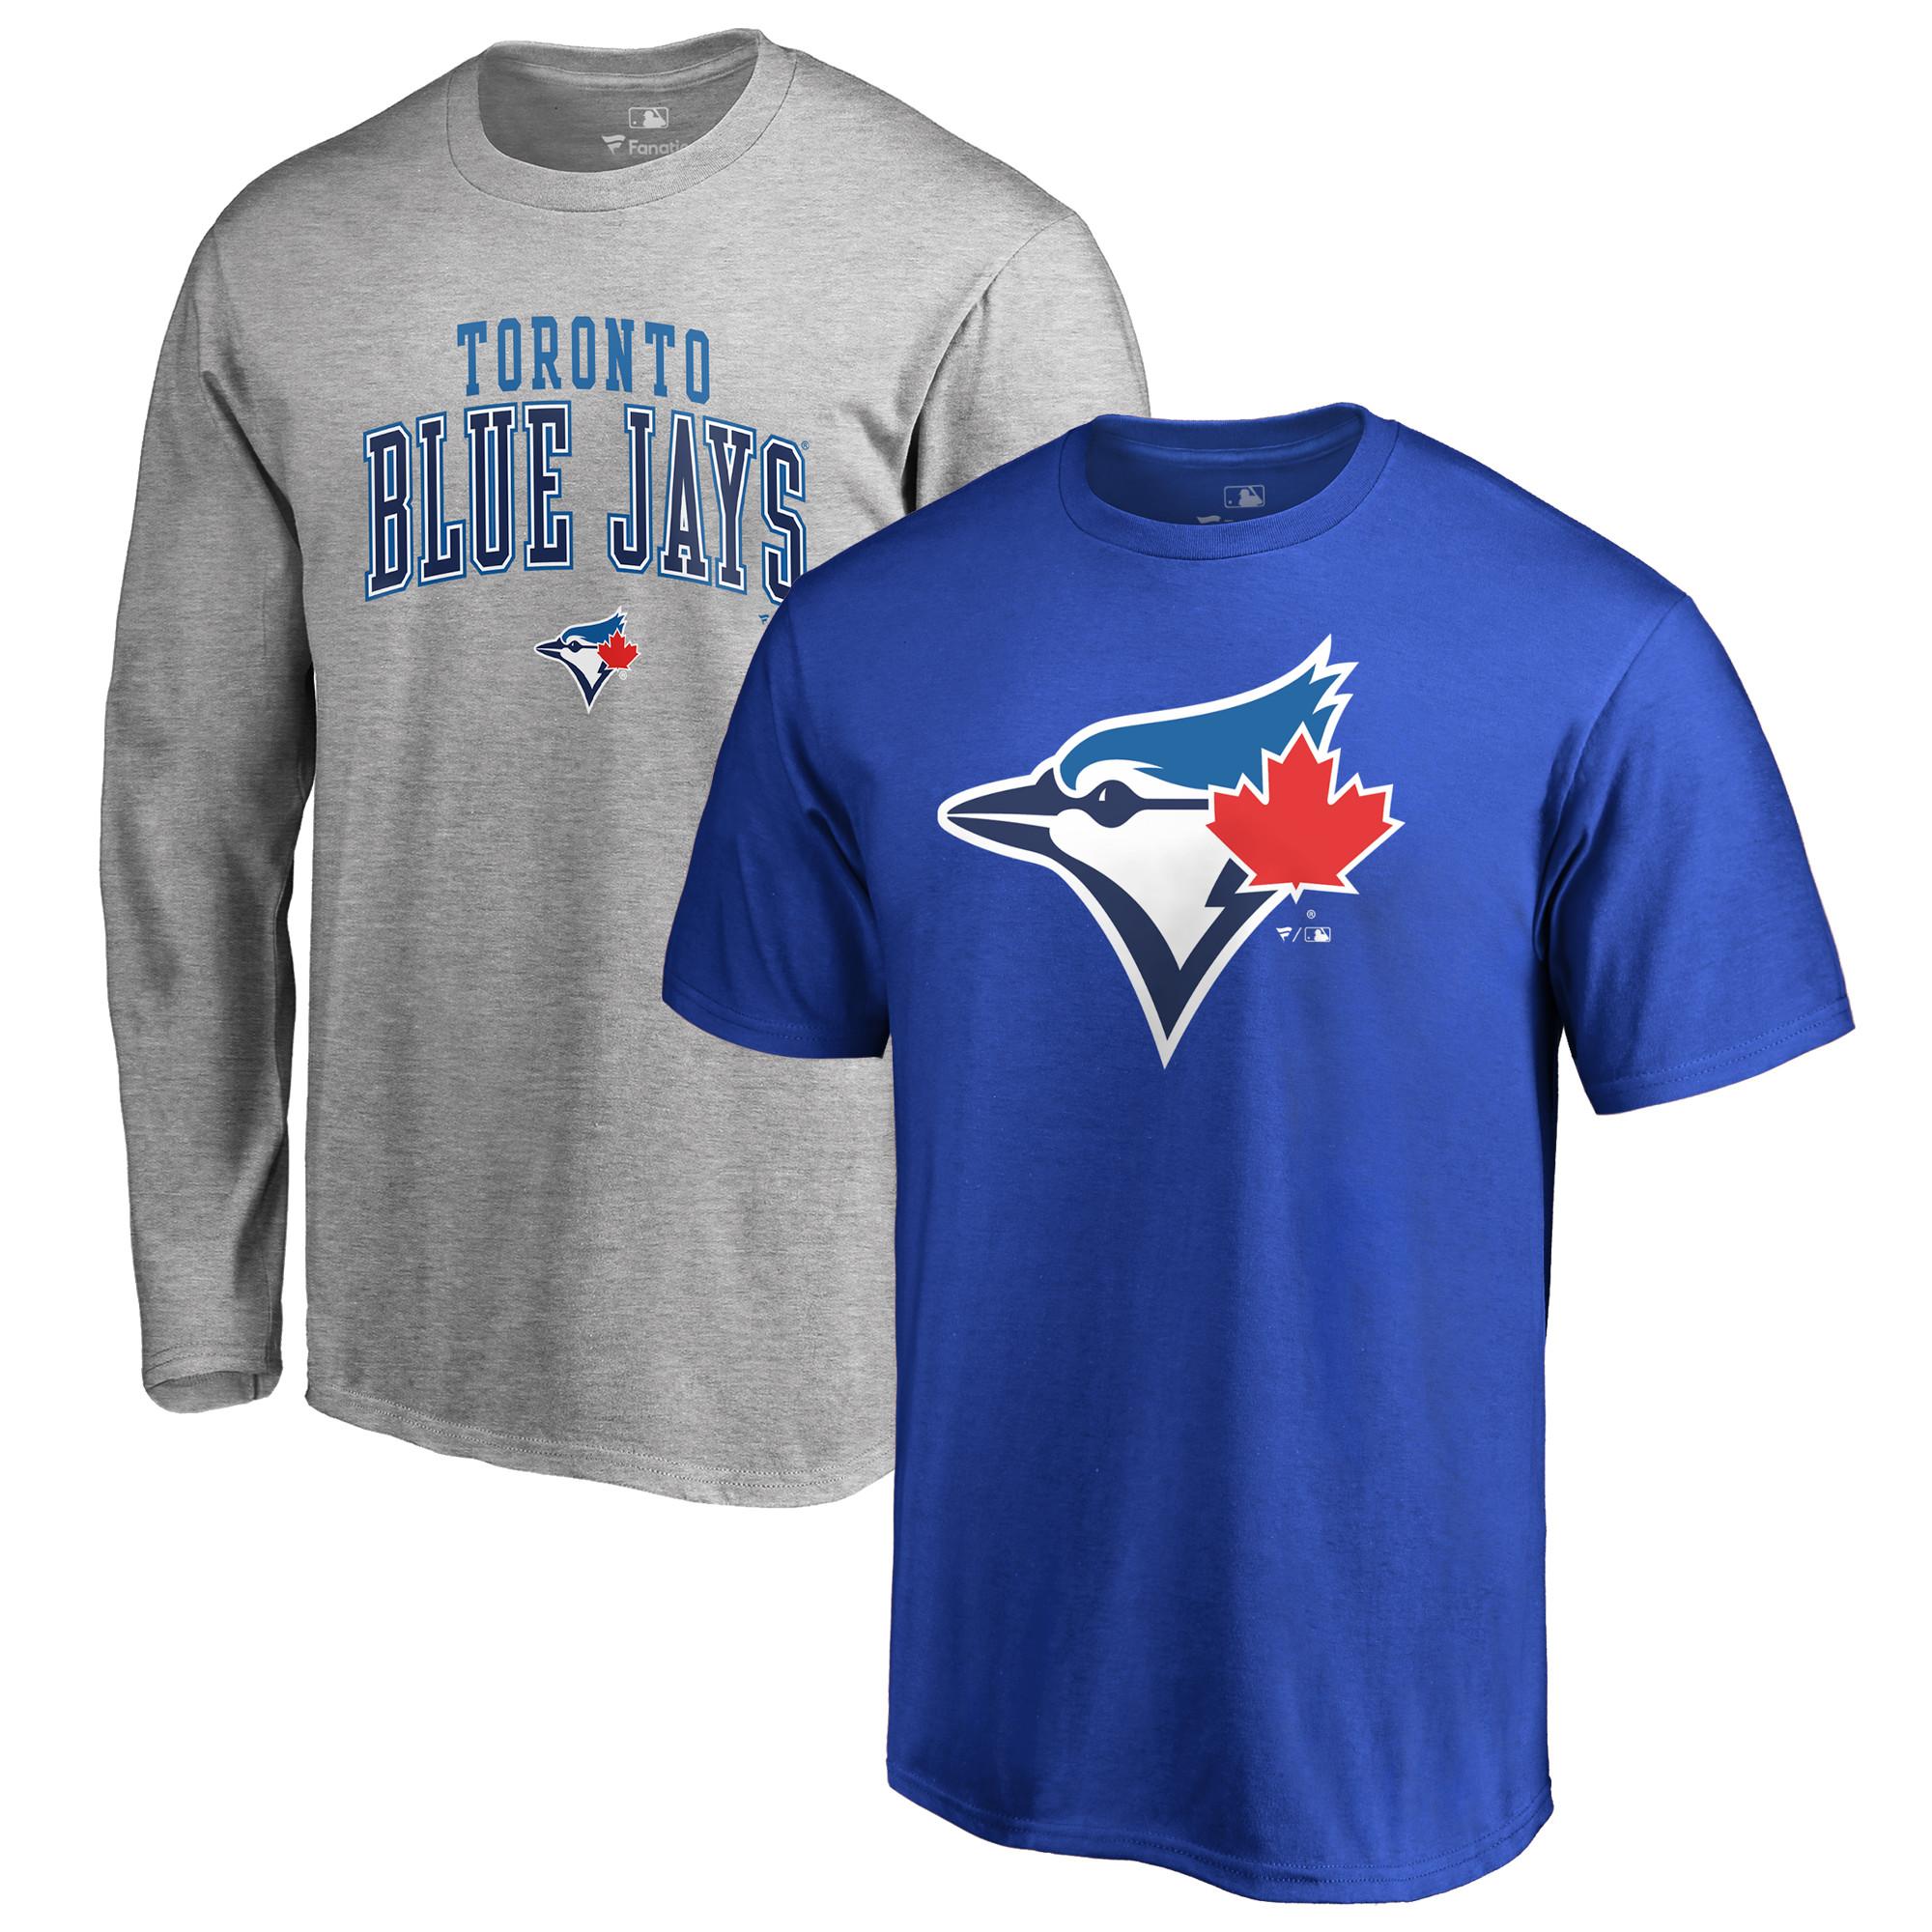 Toronto Blue Jays Fanatics Branded Big & Tall Long Sleeve & Short Sleeve T-Shirt Combo - Royal/Gray